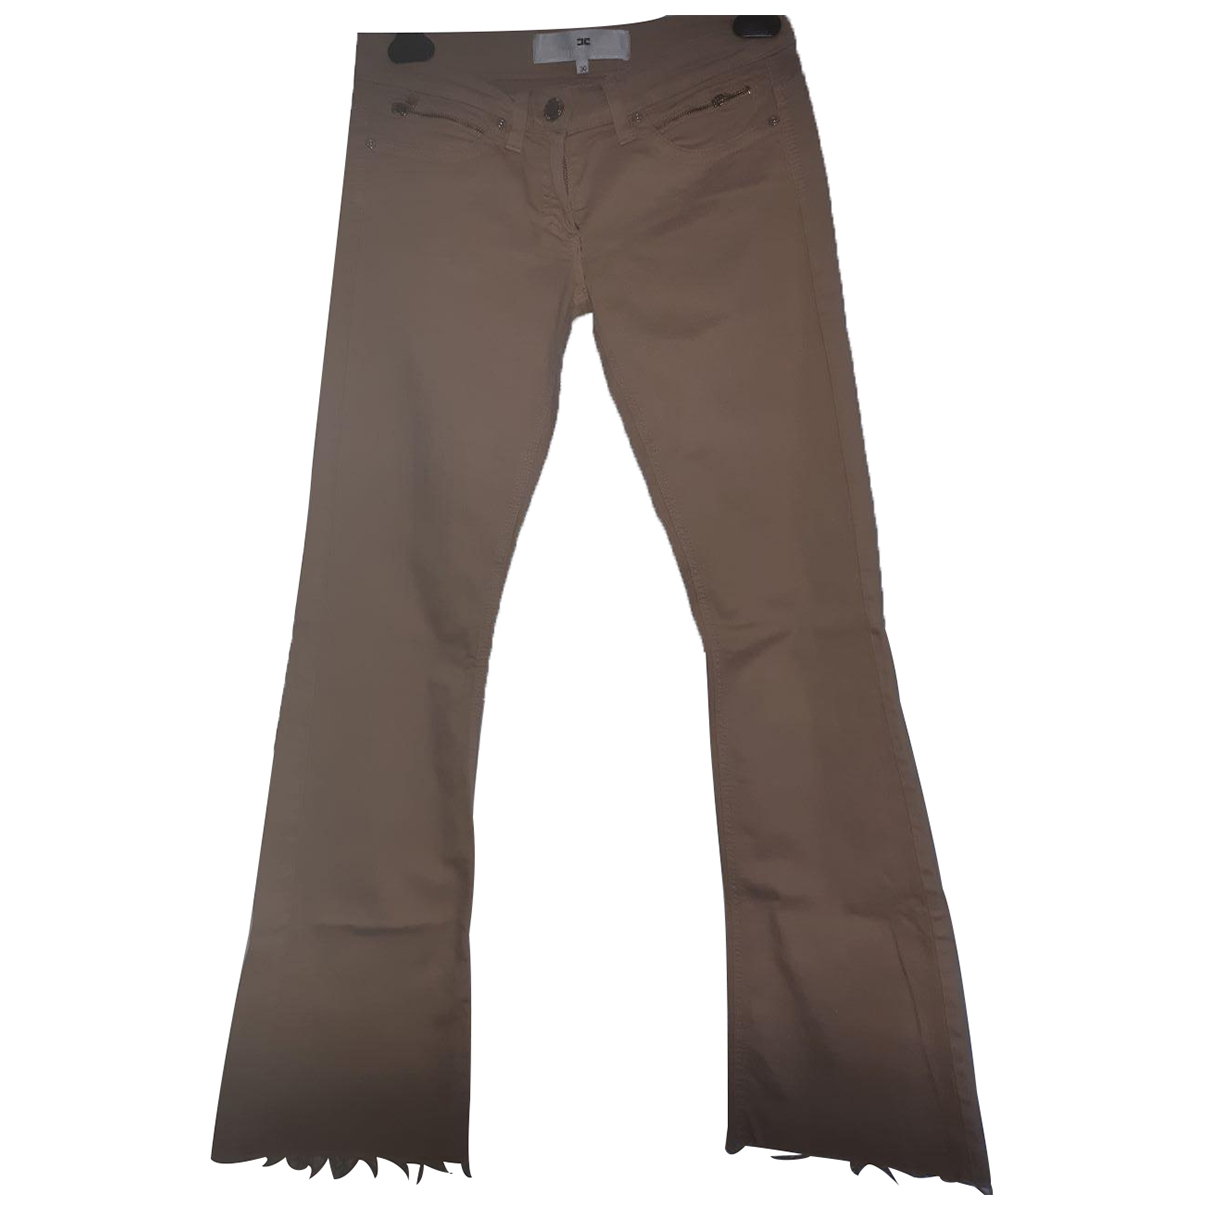 Elisabetta Franchi \N Beige Cotton - elasthane Jeans for Women 29 US